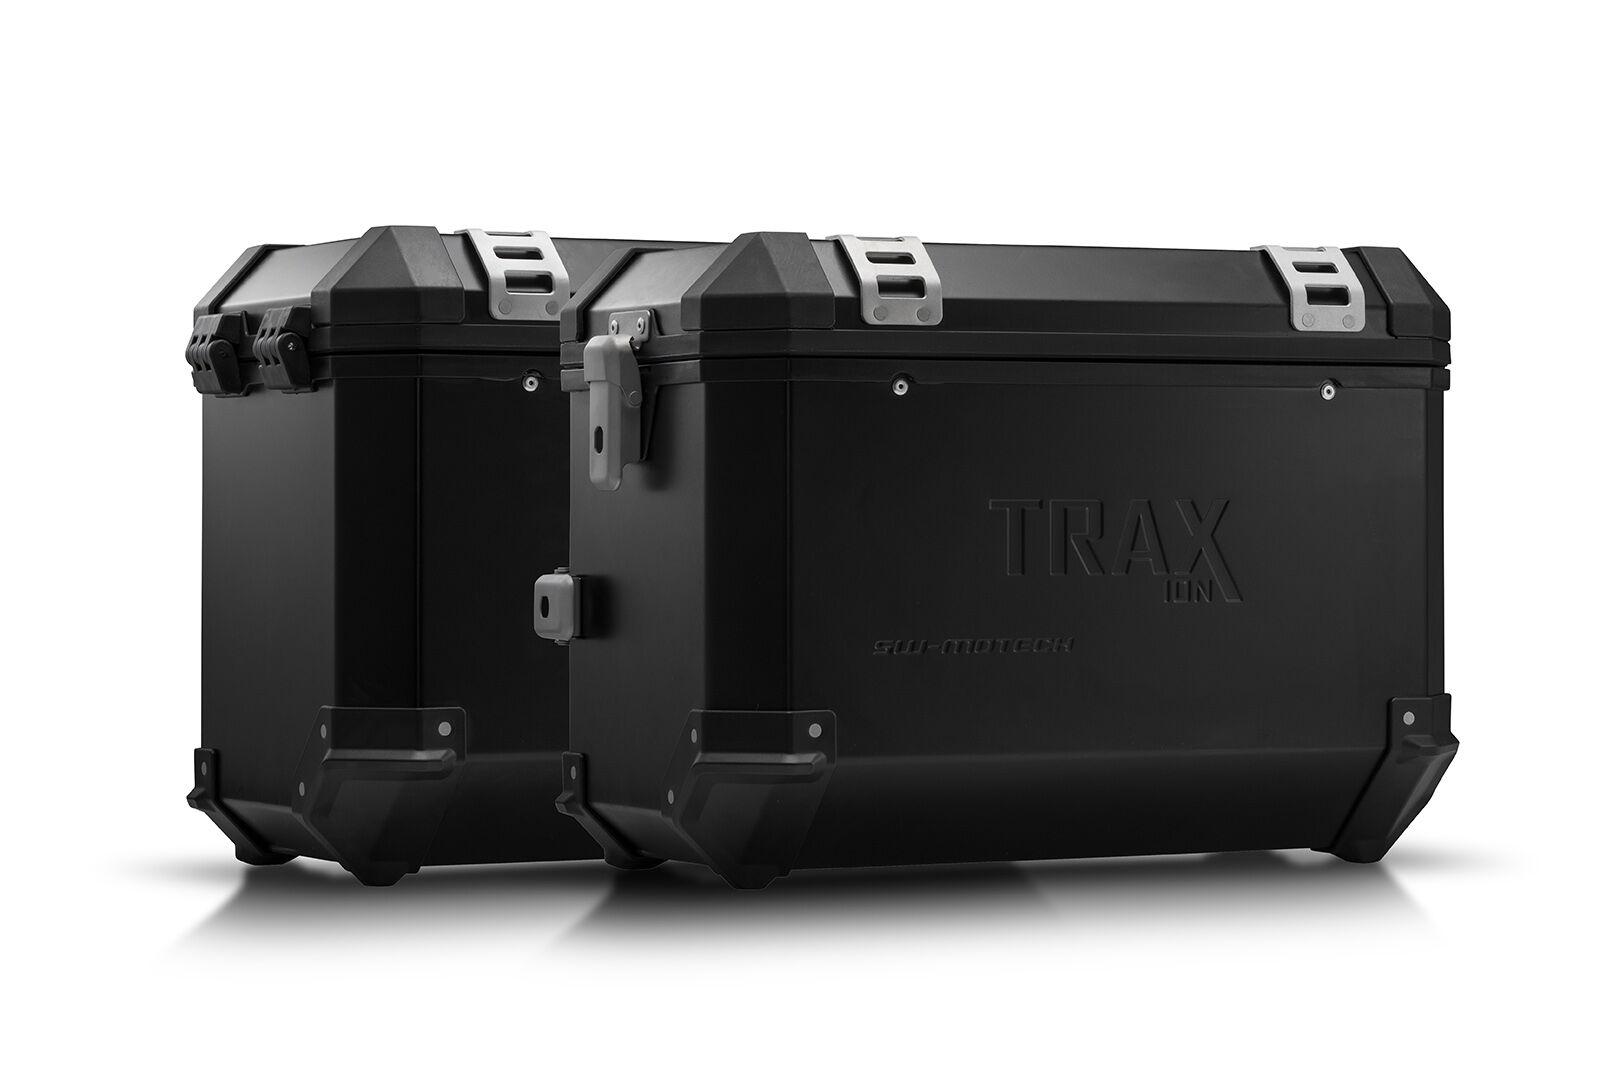 SW-Motech Sistema de maletas TRAX ION - Negro. 45/45 l. MT-09 Tracer/Tracer 900GT (17-).